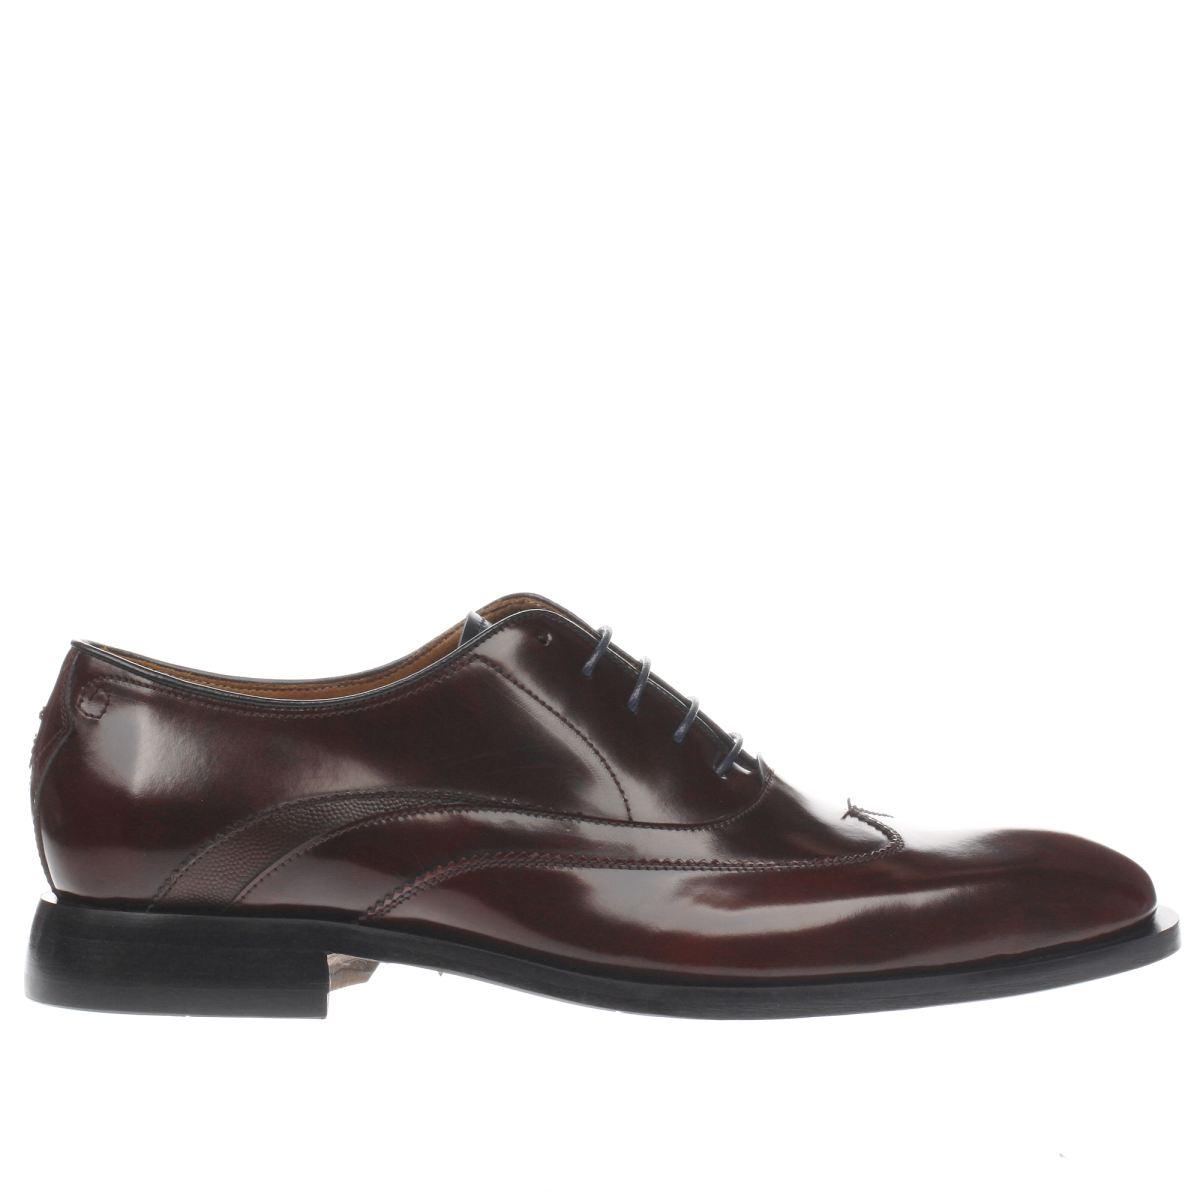 Oliver Sweeney Oliver Sweeney Burgundy Alassio Shoes